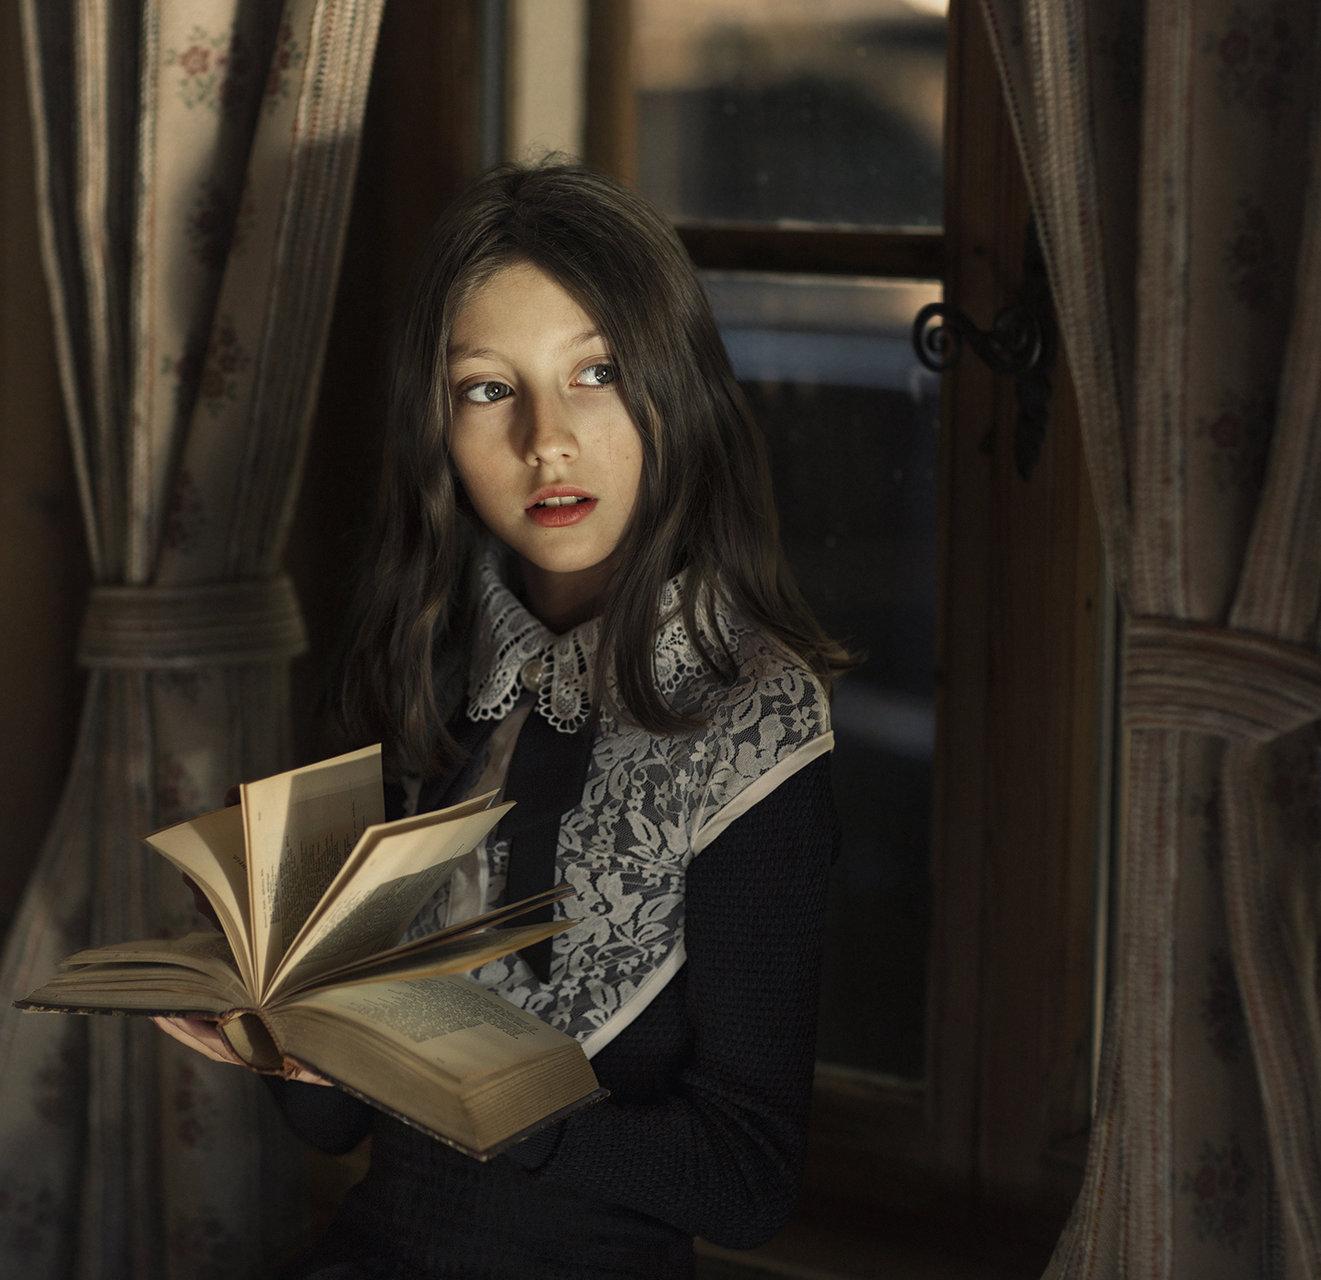 Photo in Portrait | Author desiart78 | PHOTO FORUM